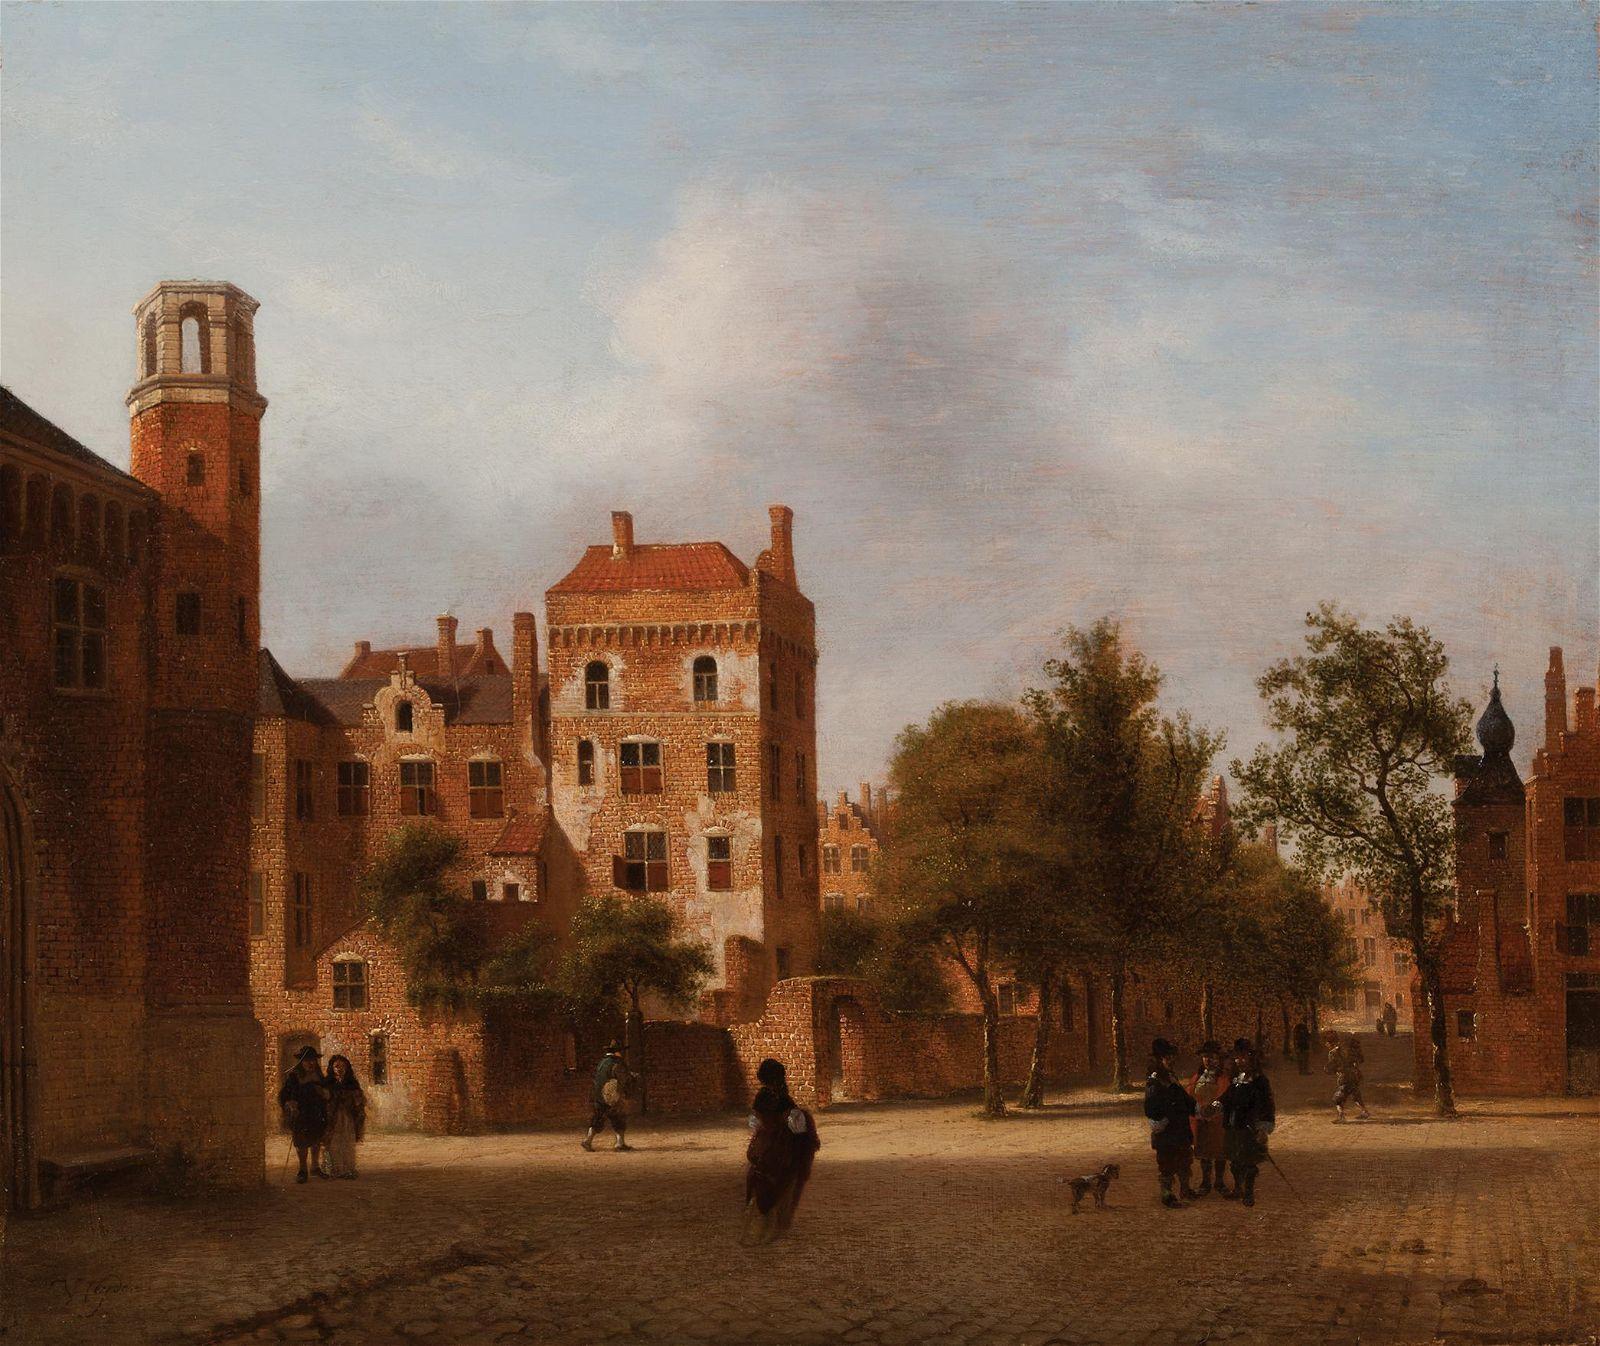 Jan Van Der Heyden, An Imaginary View of a Town with El